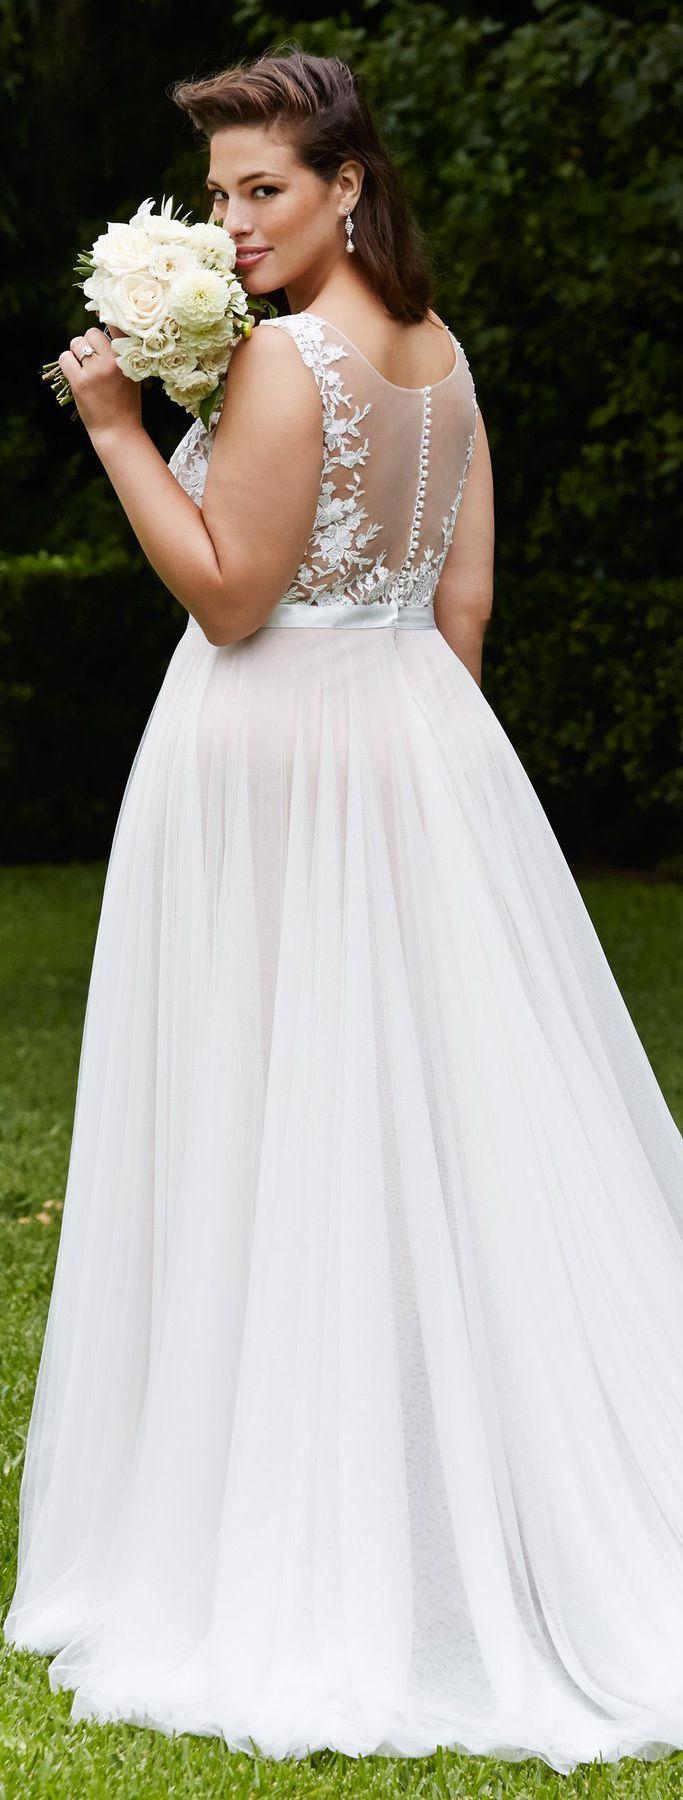 wedding dresses for mature brides photo - 1